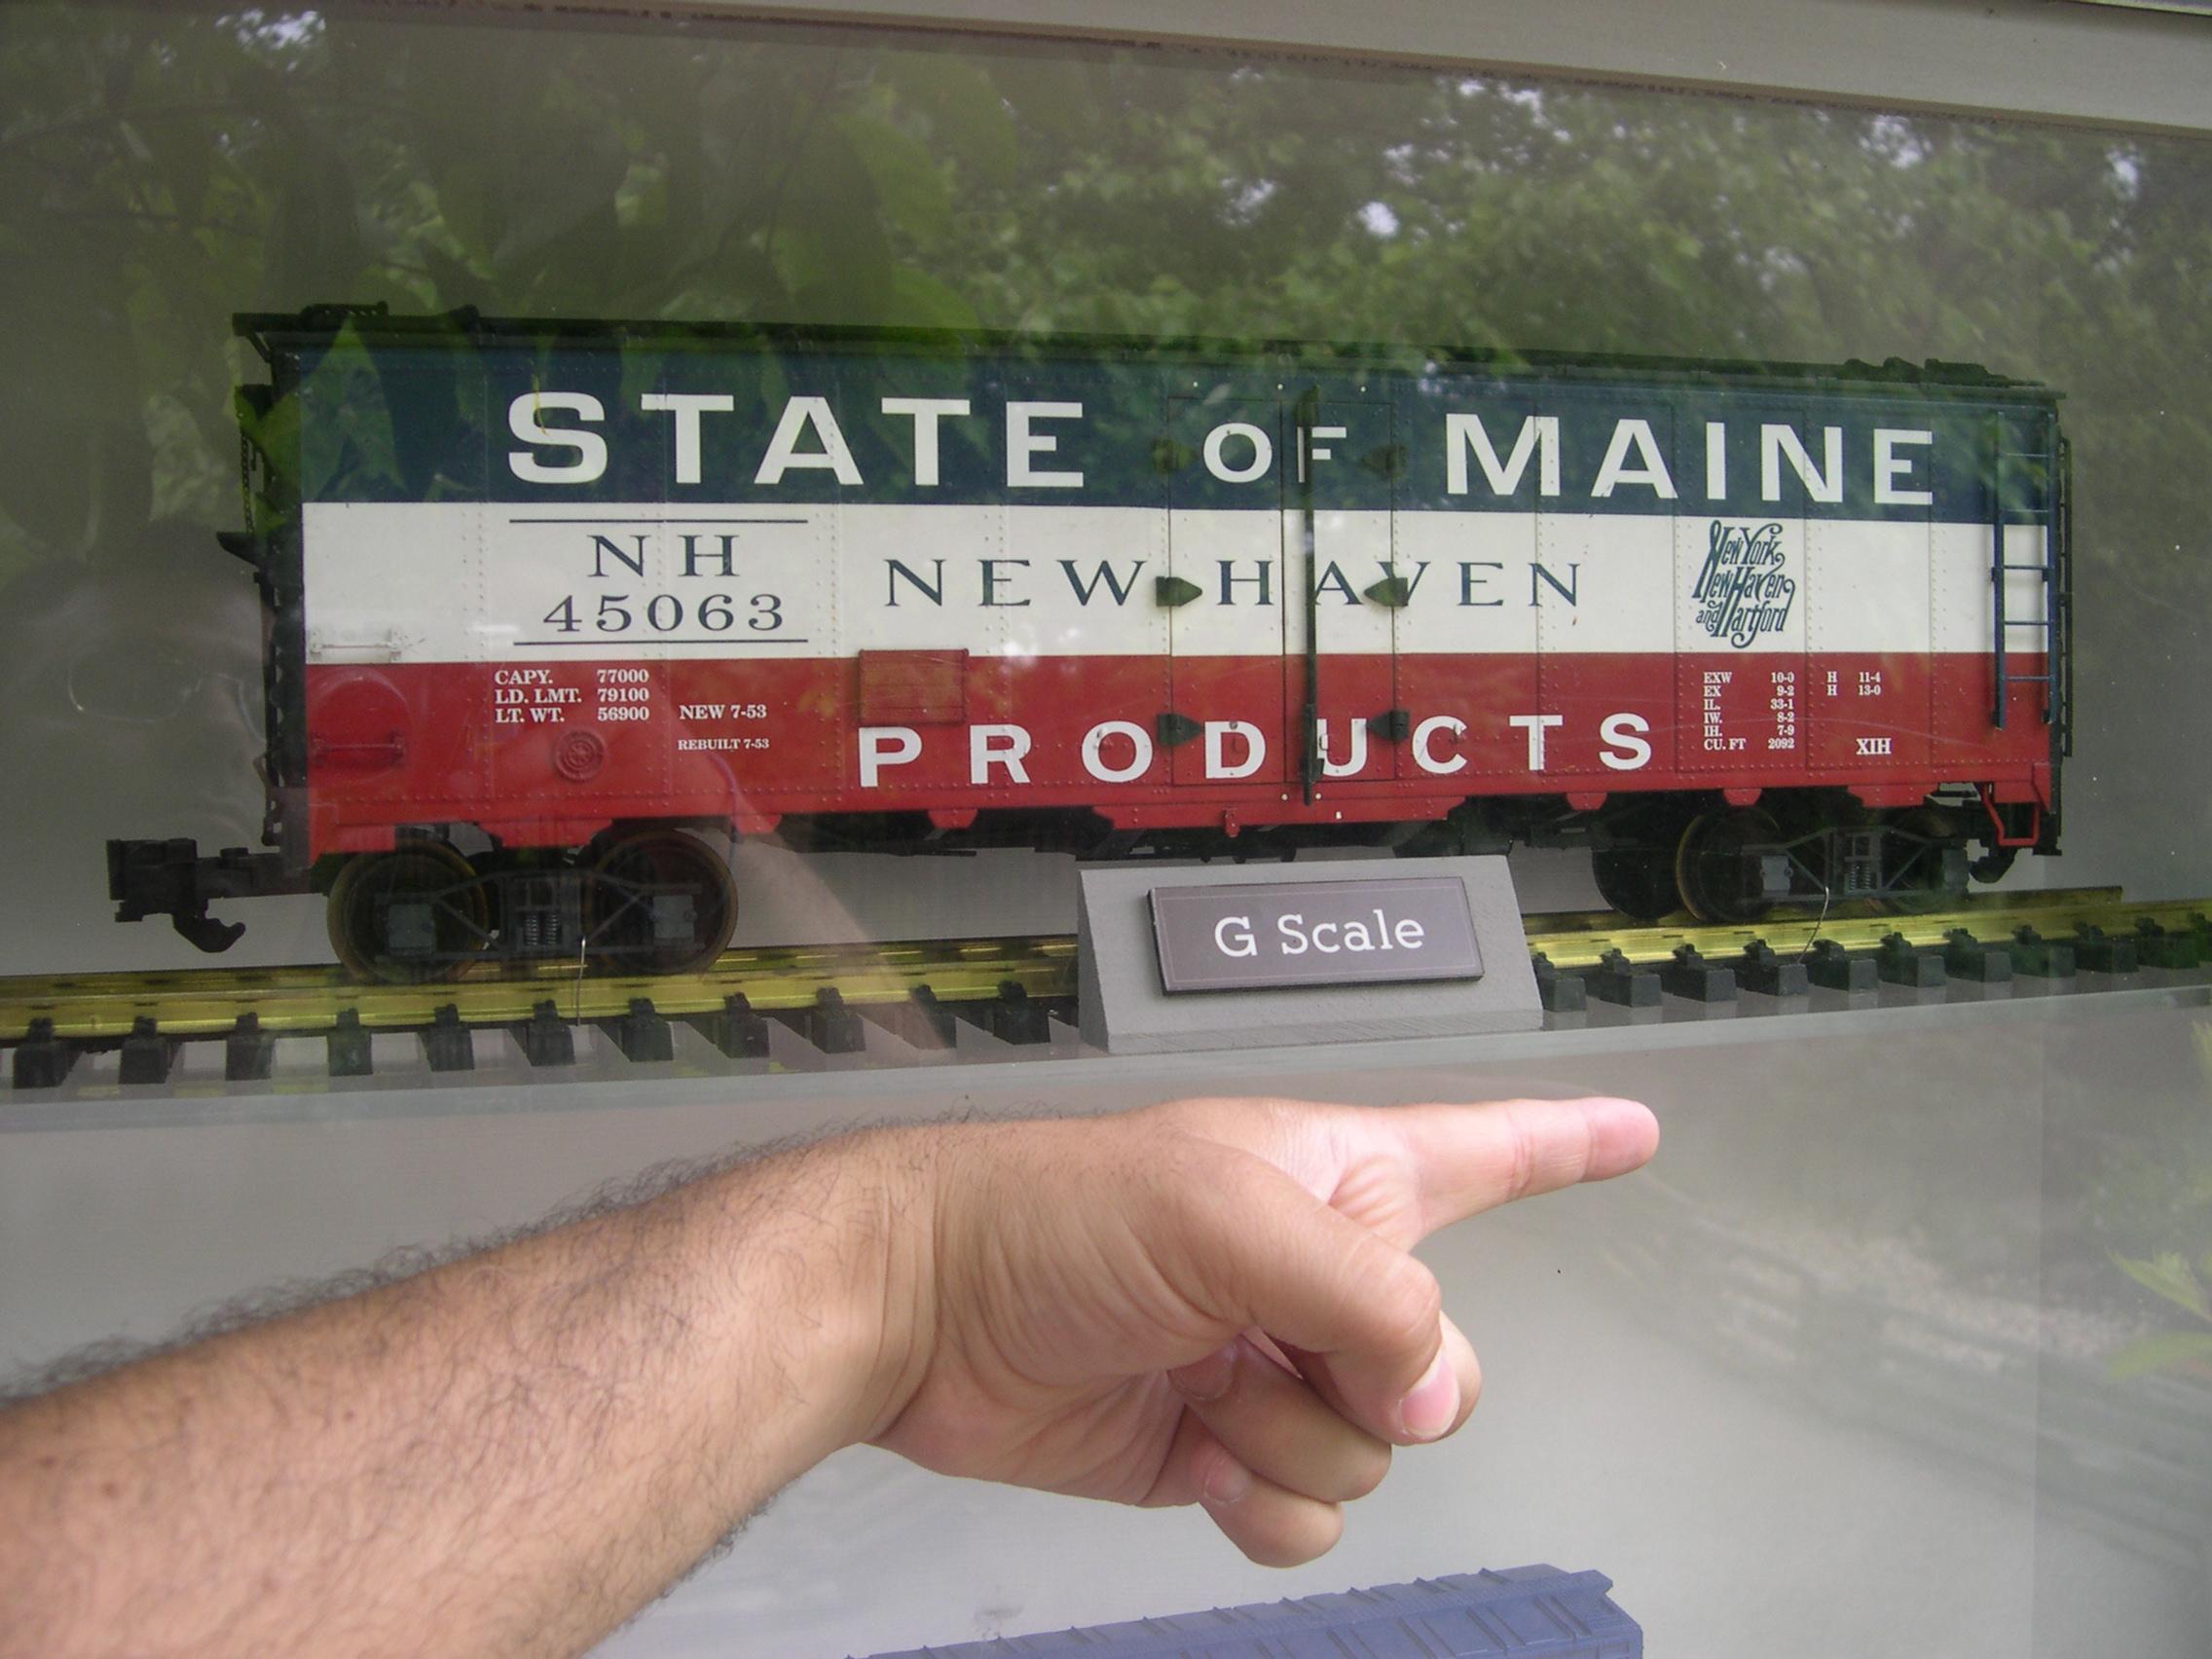 Train scale matchbox cars